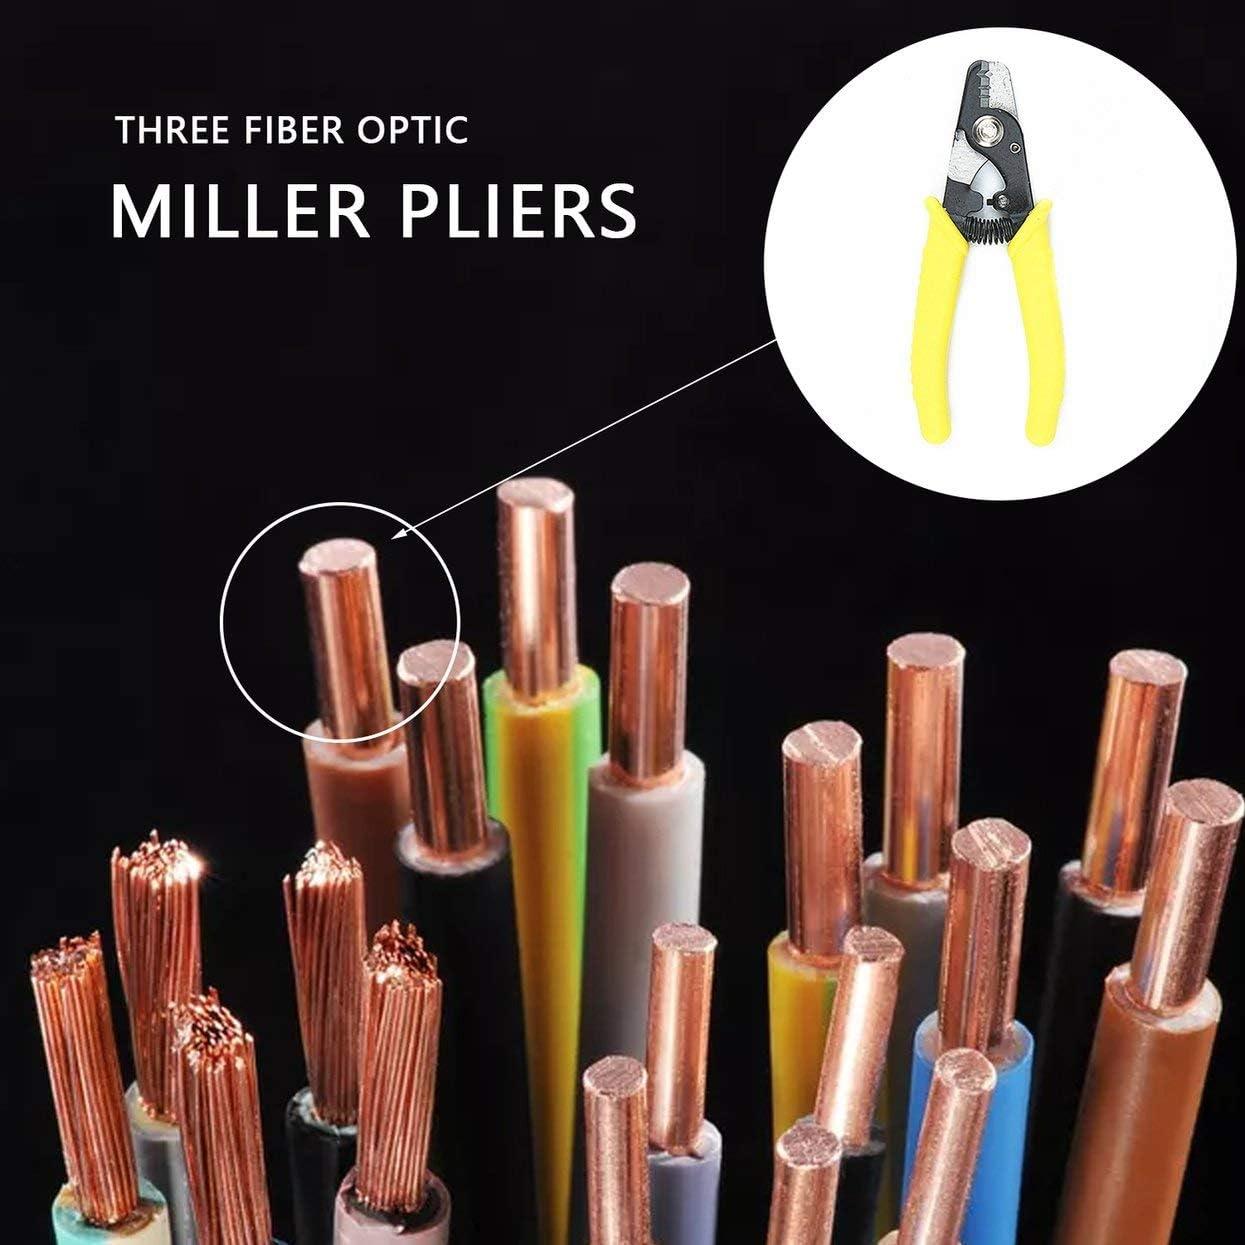 Tree-on-Life Pinza spelafili Fibra Miller Fis Tri-Hole Fibra Ottica Stripper Tre Fori Fibra Ottica Stripper Miller Wire Stripper